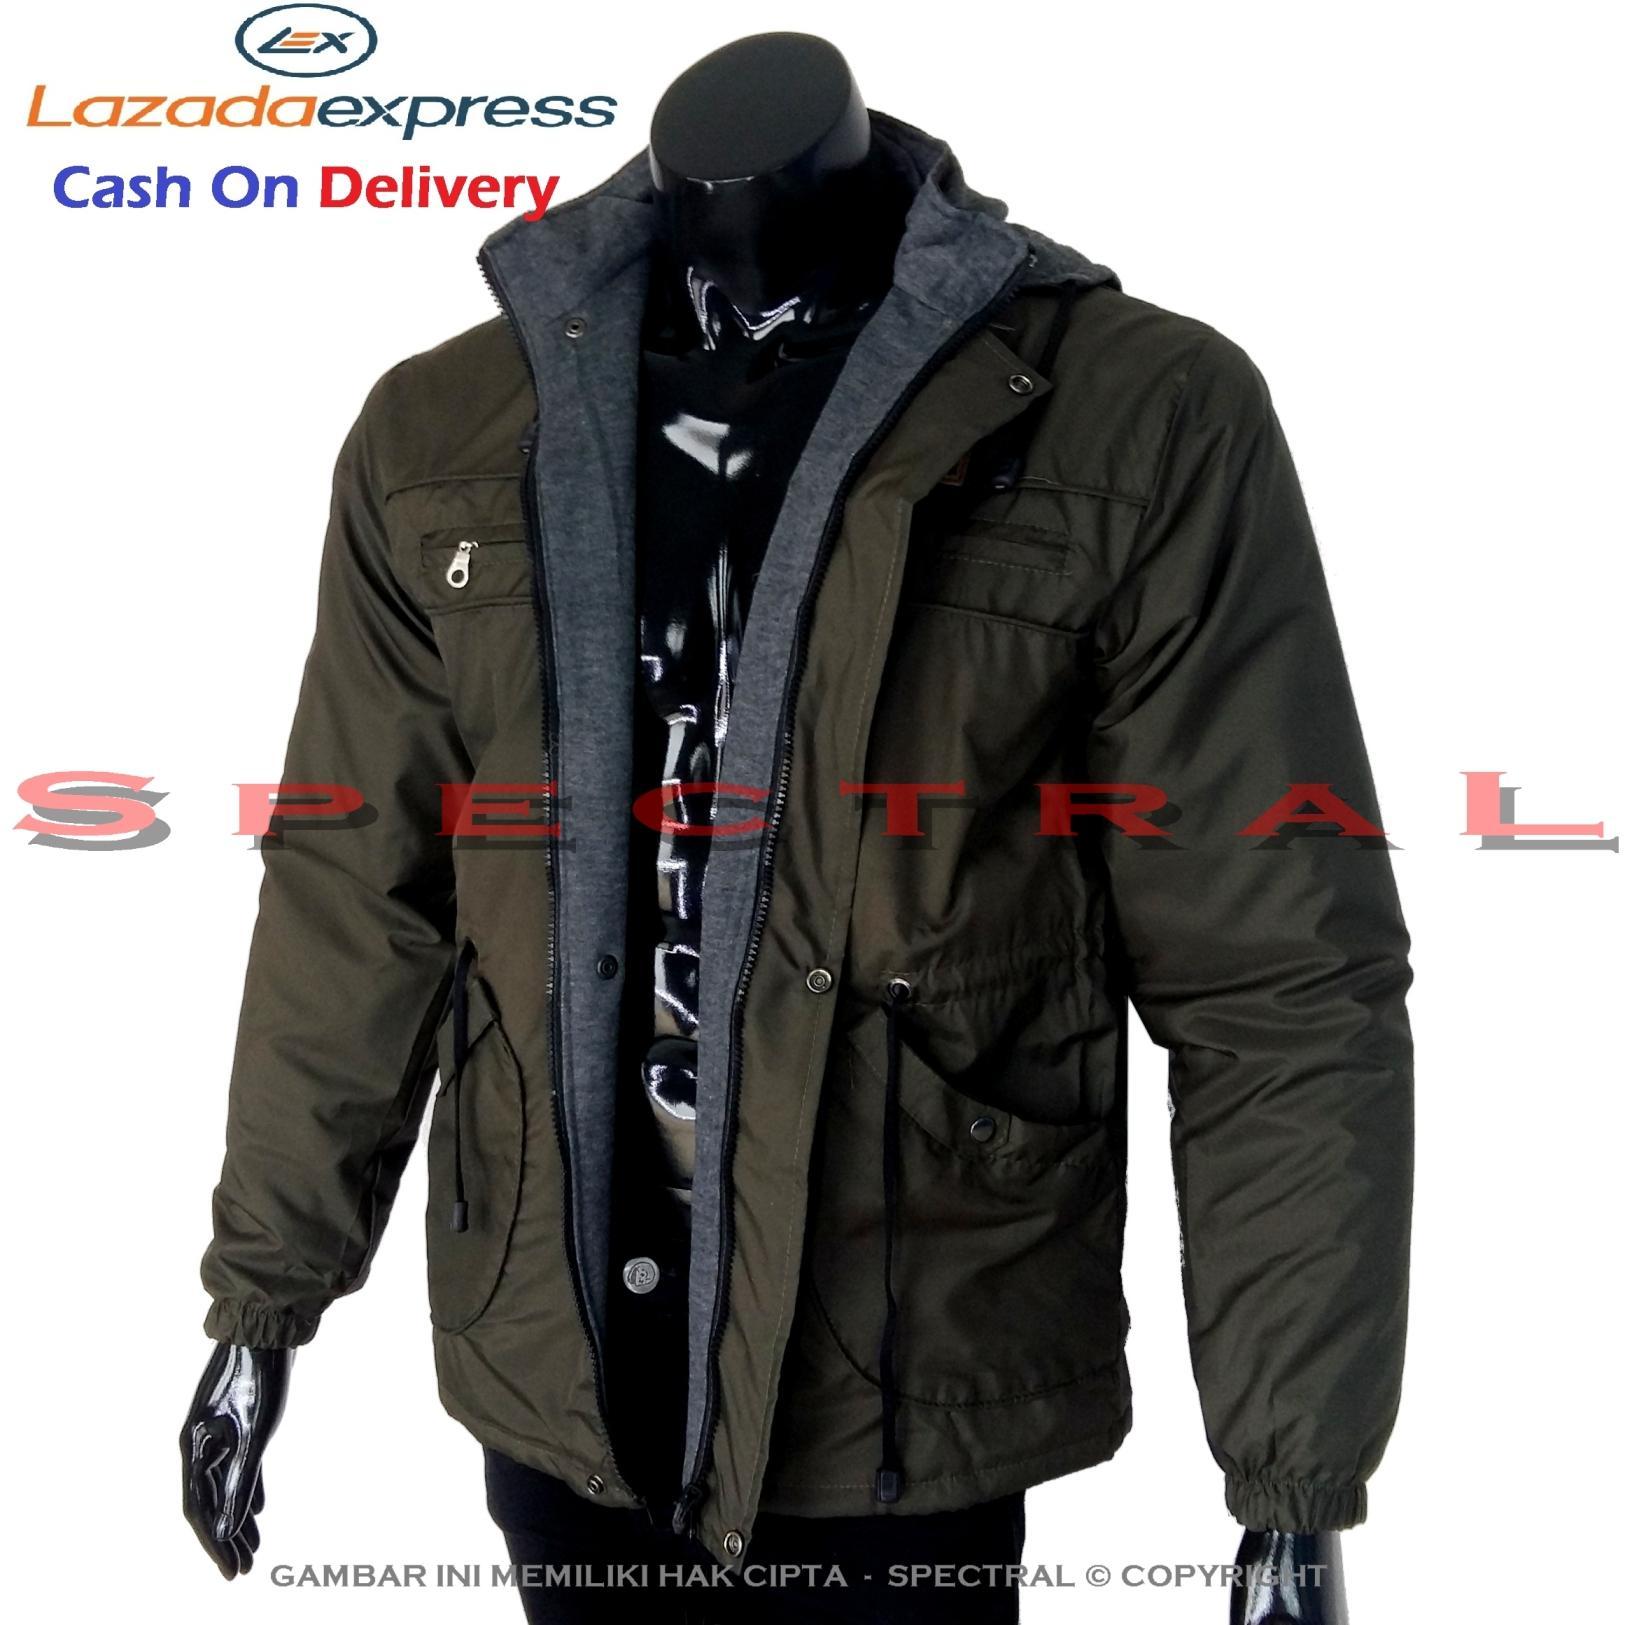 Spectral – Jaket PARKA Hijau Army Parasut Bolak Balik Jacket Sweater Hoodie Switer Jeans Parka Switer Bomber Armi